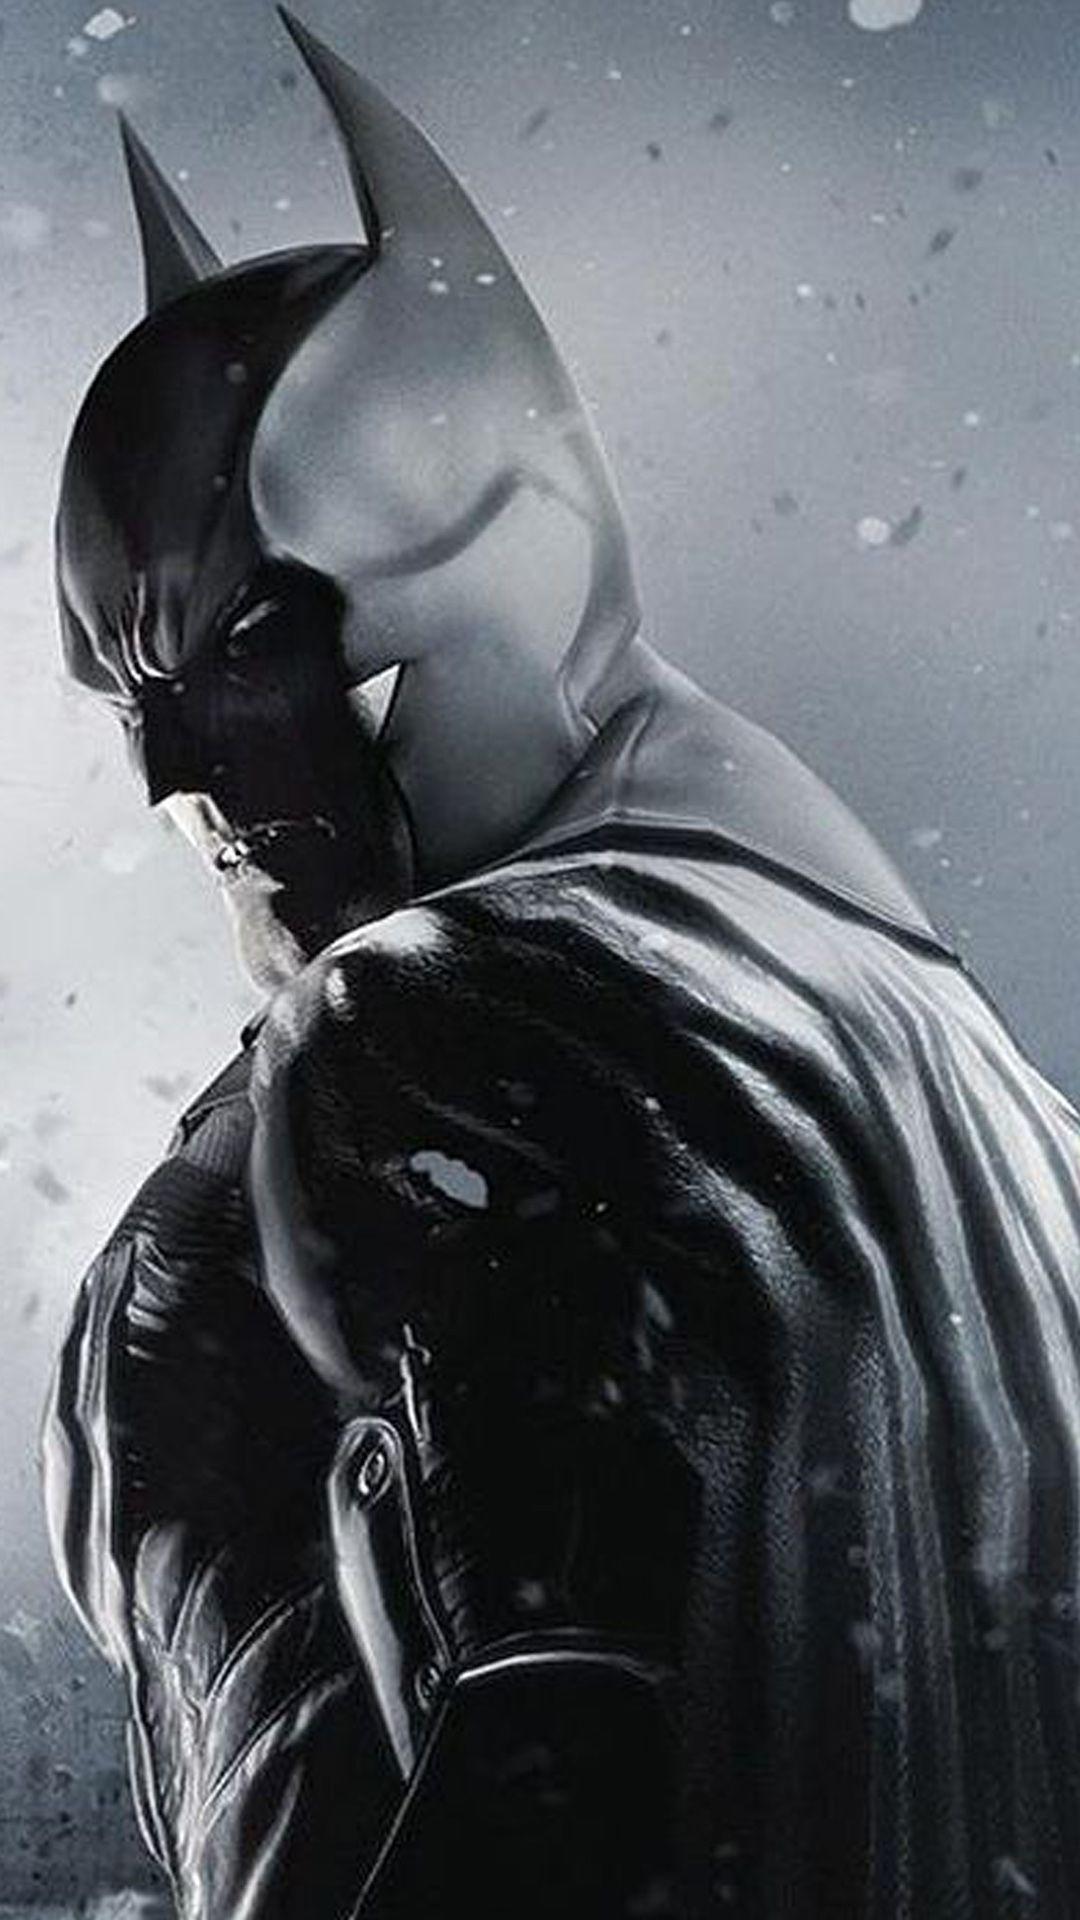 Batman Wallpapers Top Free Batman Backgrounds